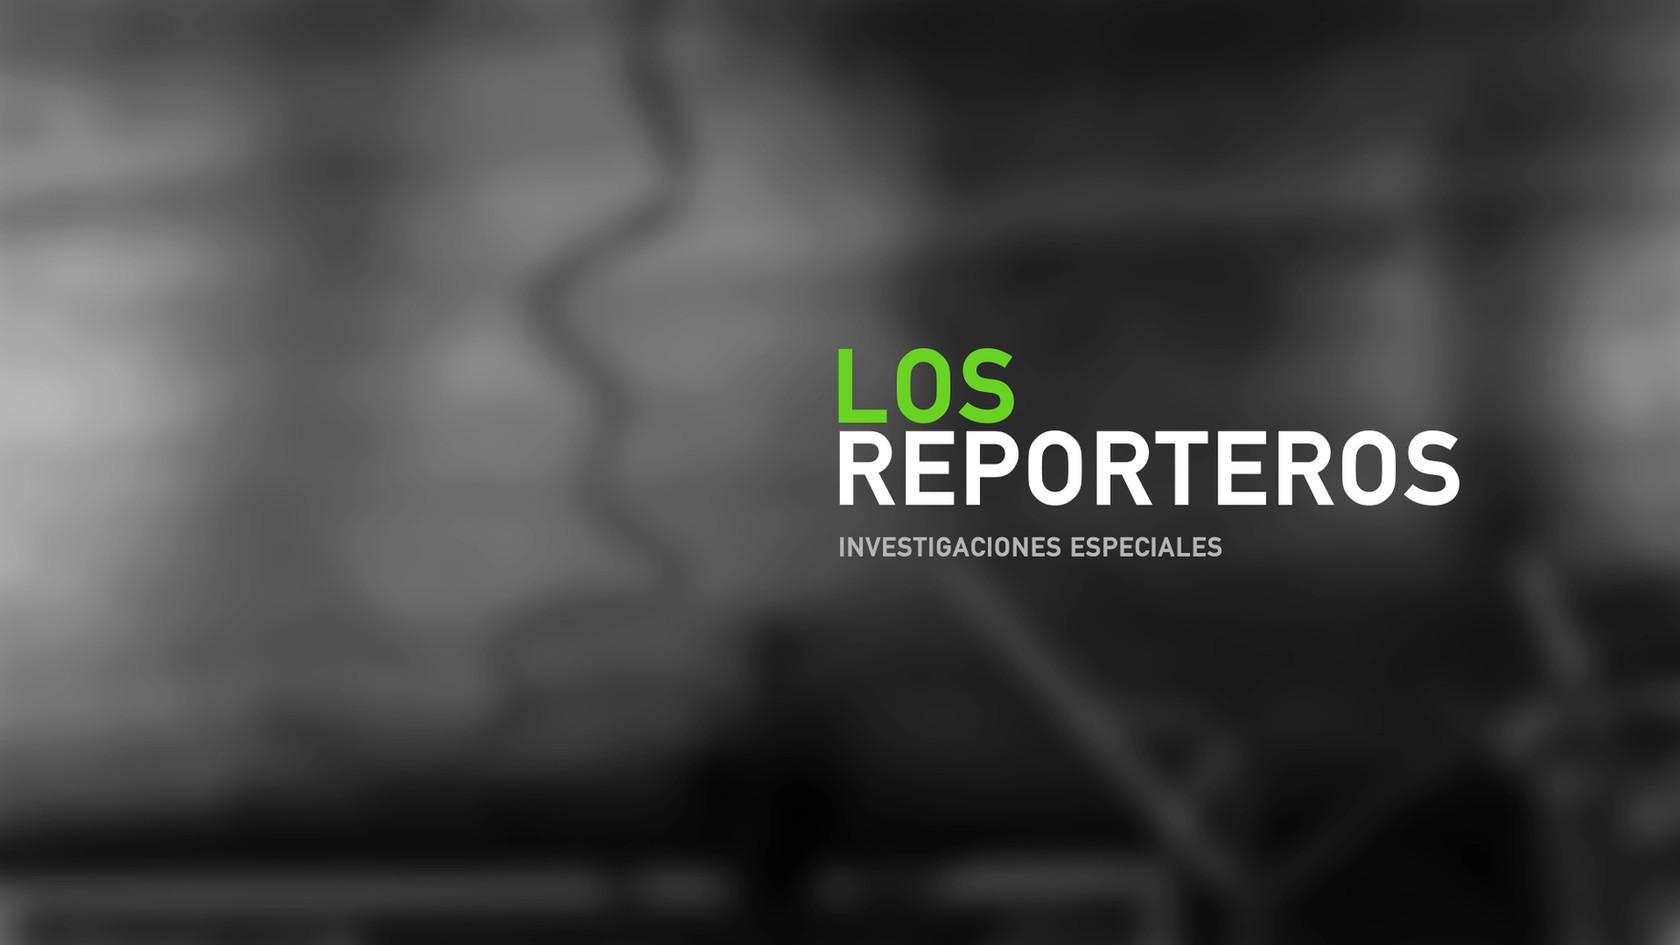 OPENING REPORTEROS 2013 (0.00.51.00).jpg